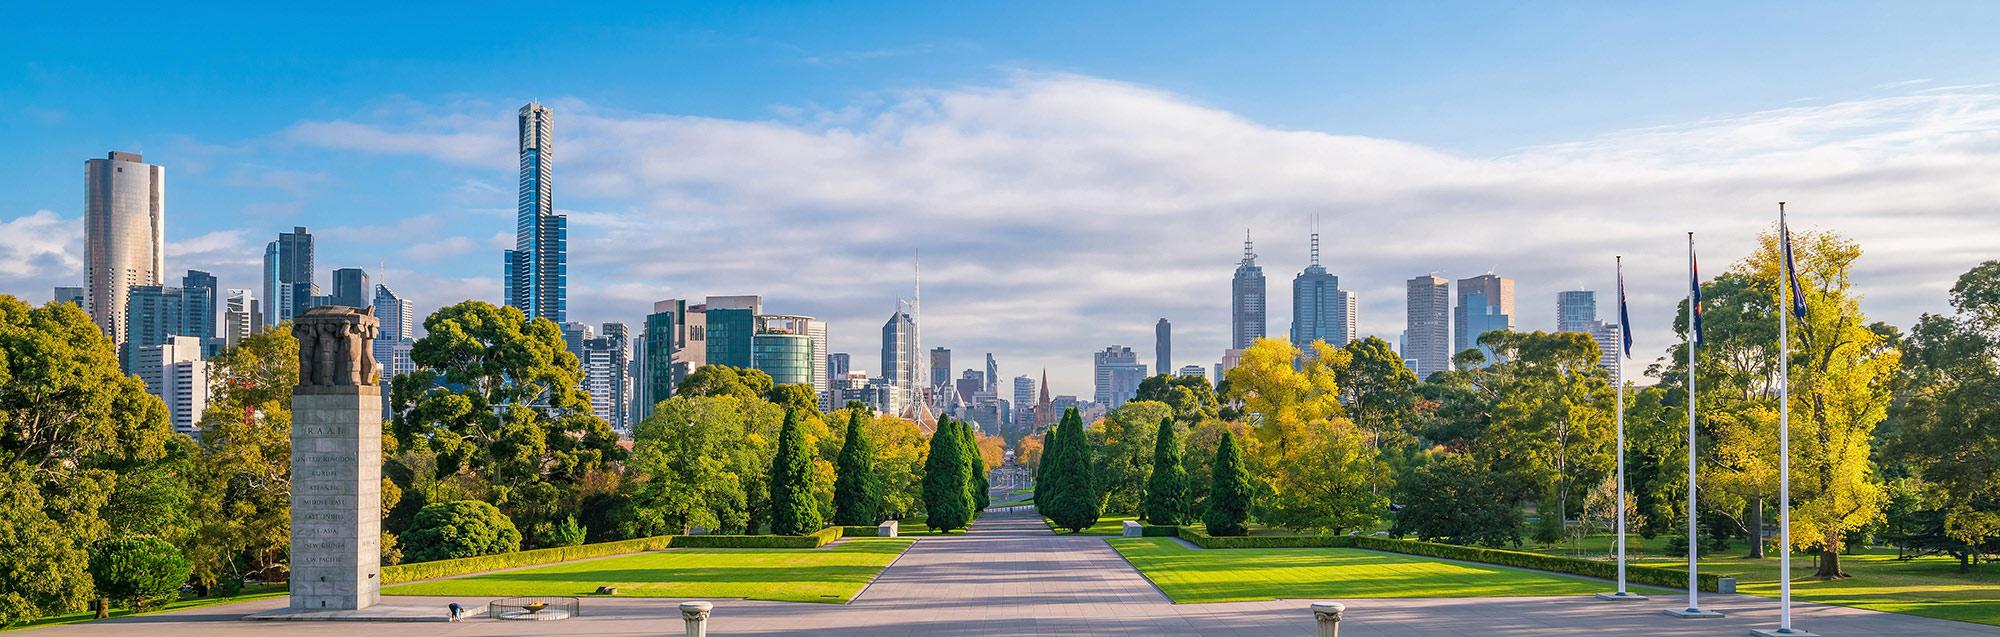 Vacanze studio a Melbourne